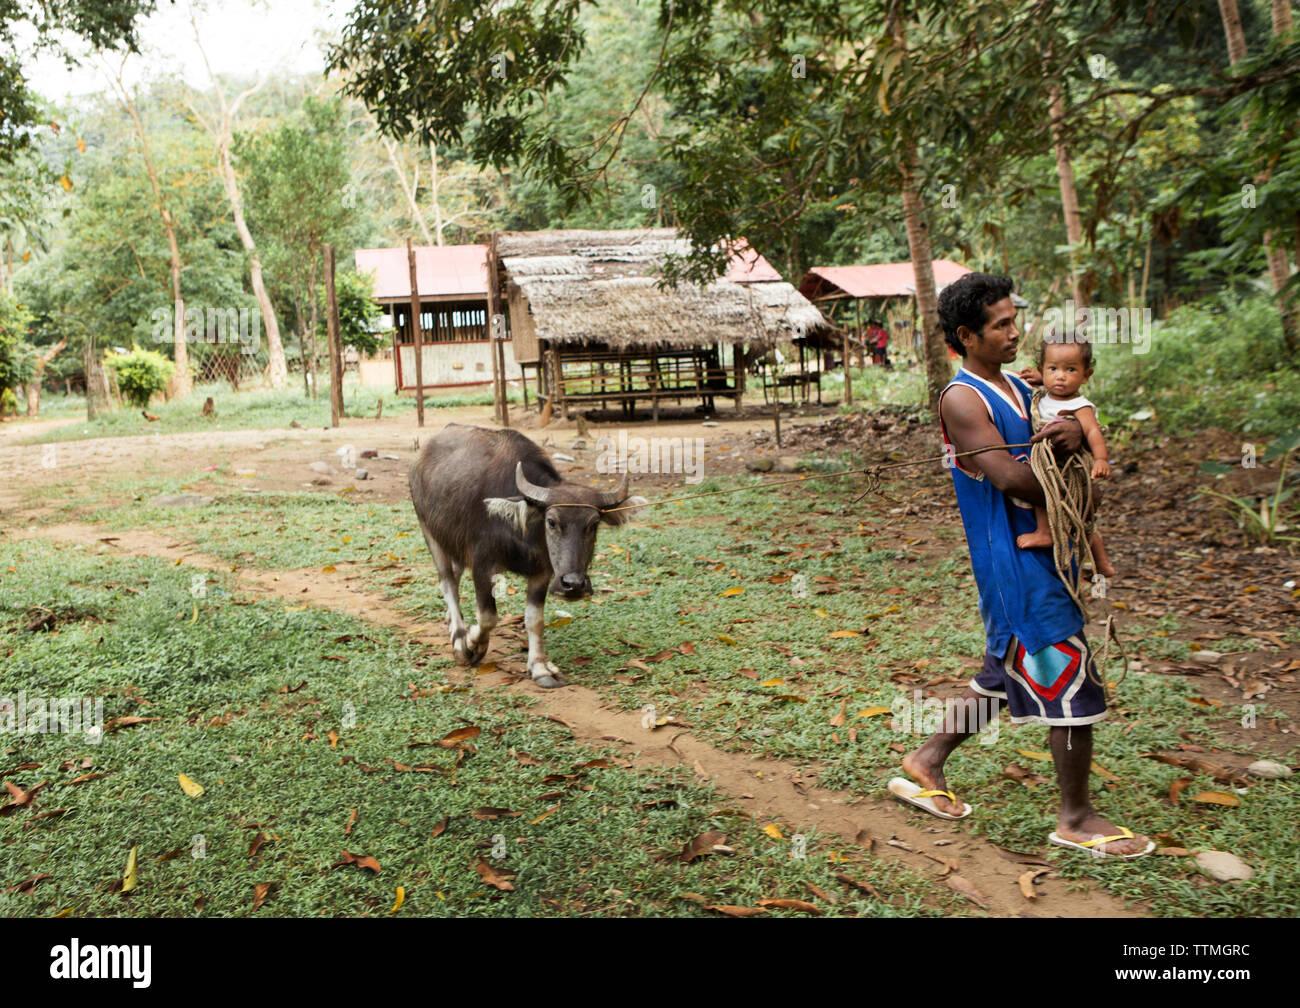 PHILIPPINES, Palawan, Barangay region, a Batak man named Gadong Sa'avedra walks with his niece Liralyn while leading a cow in Kalakwasan Village - Stock Image